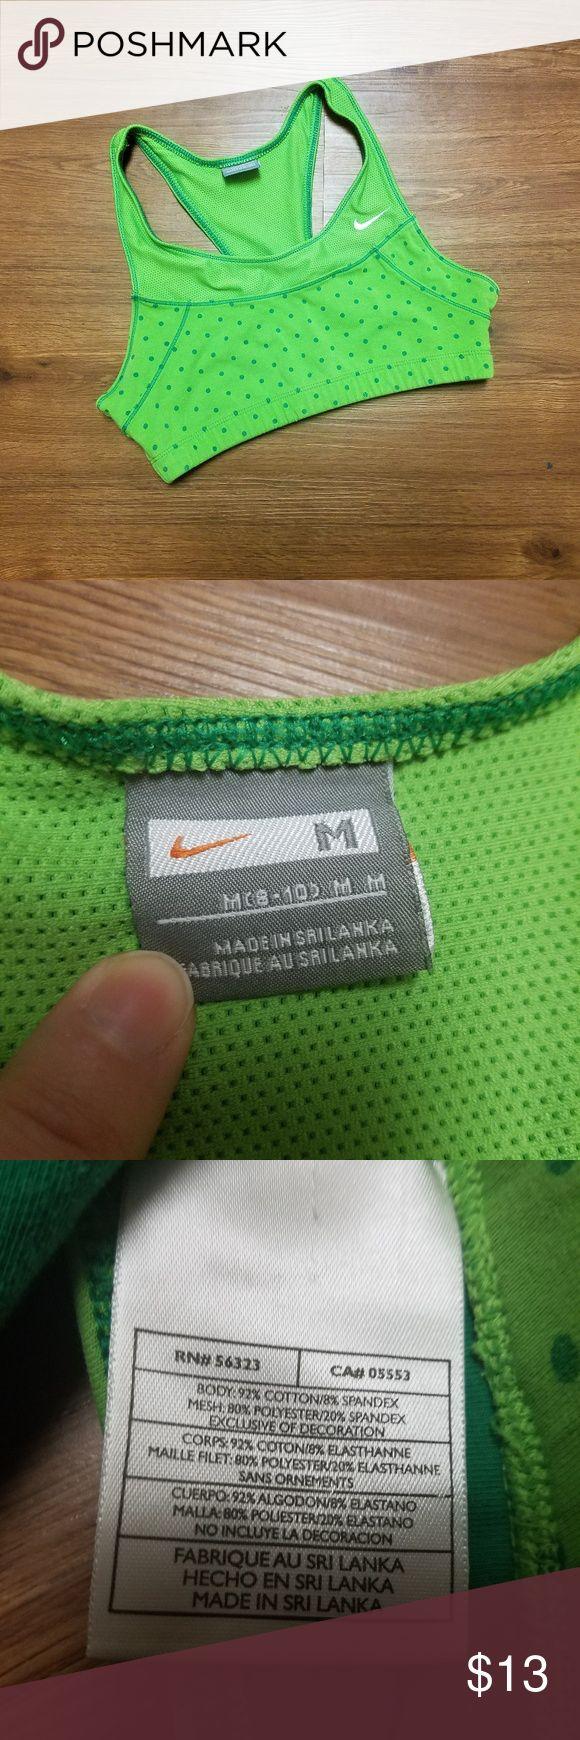 Nike green polka dot sports bra (M) Nike green polka dot sports bra. Women's size medium. Very stretchy. Nike Intimates & Sleepwear Bras